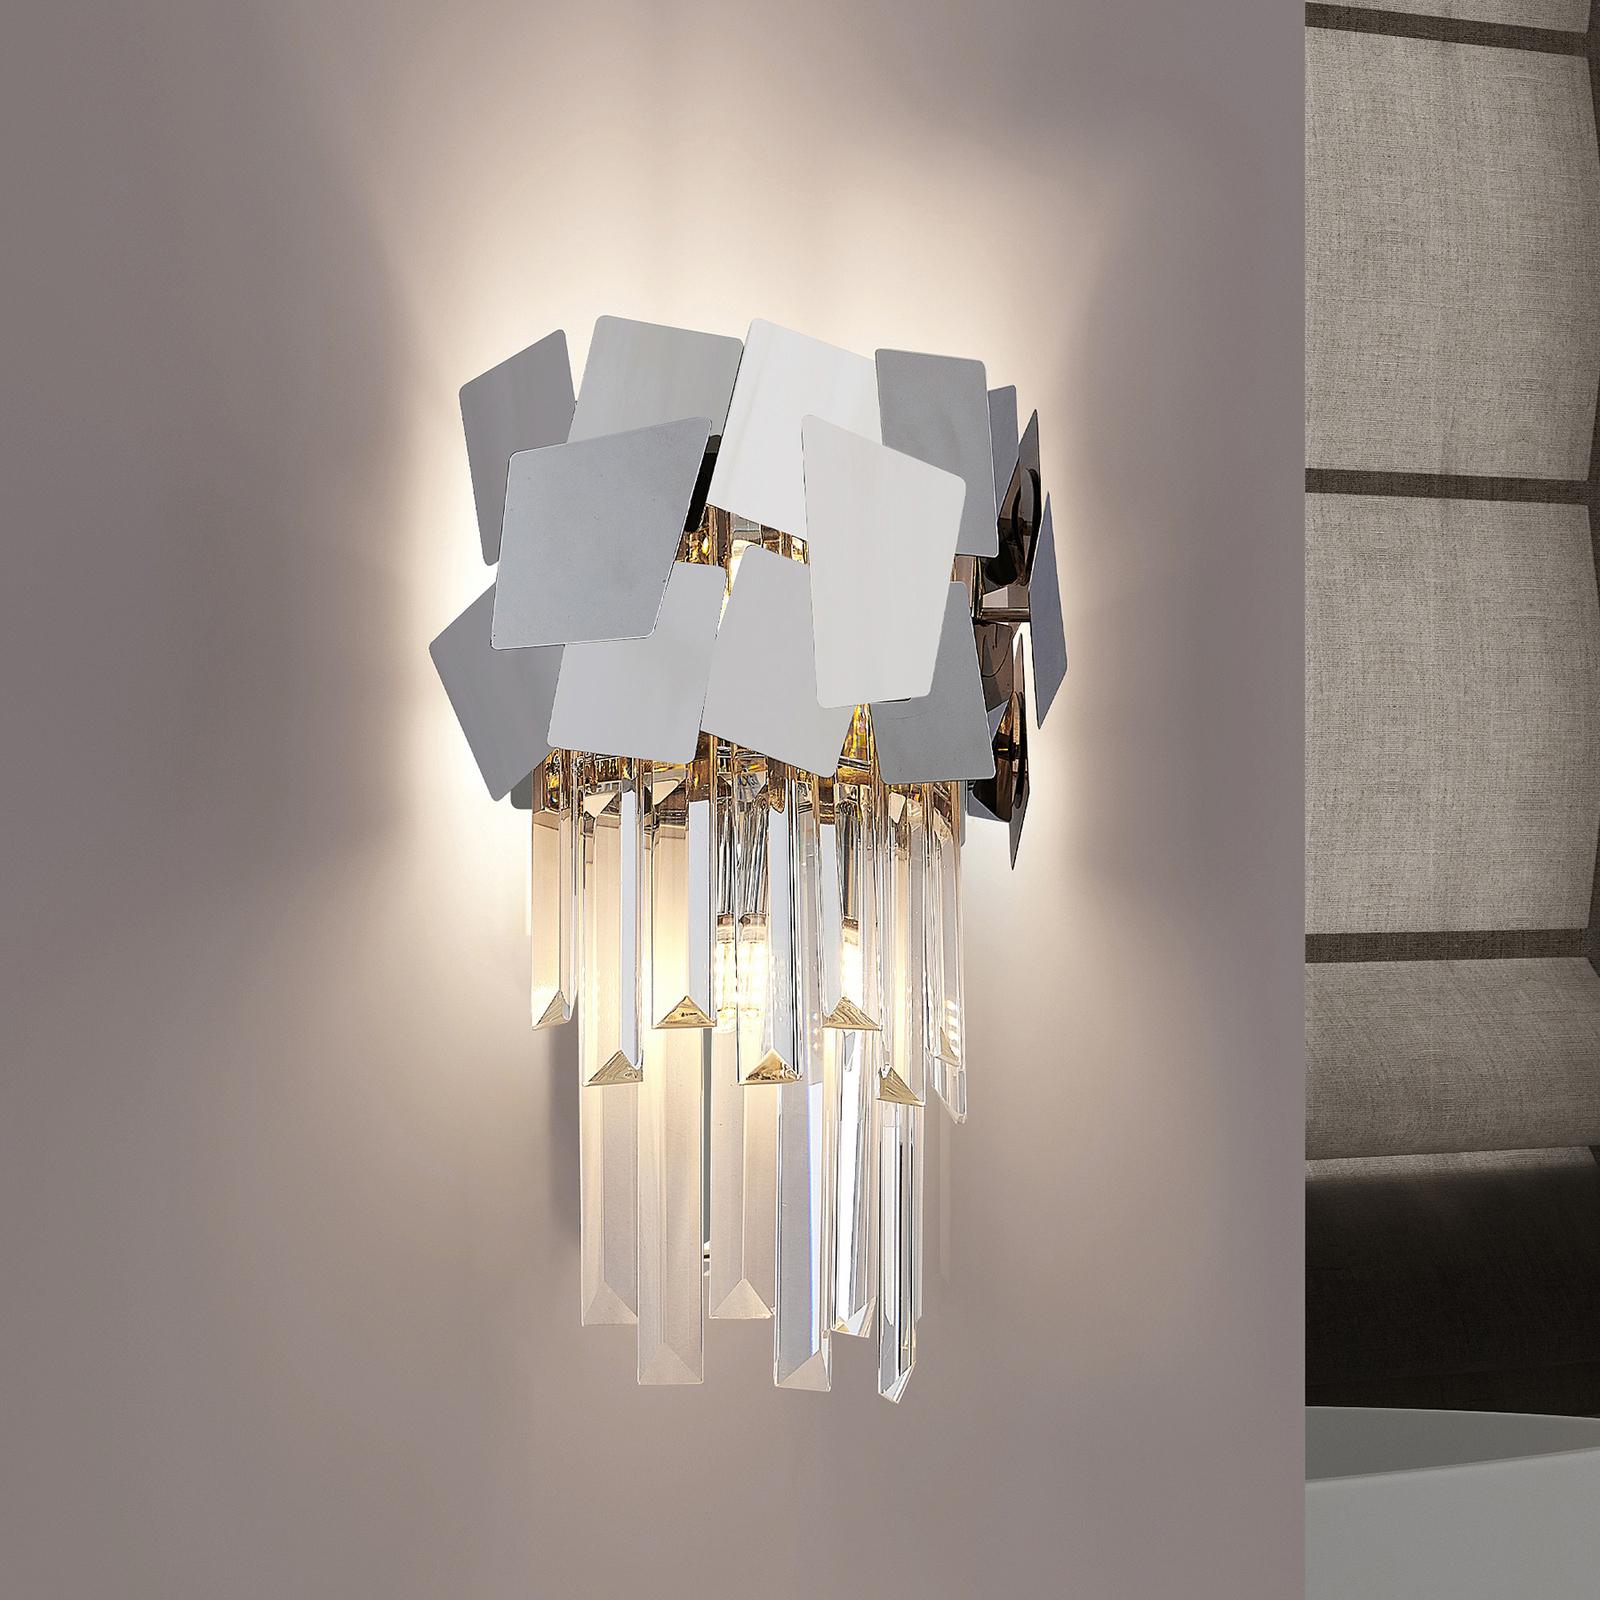 Lucande Miraia krystall-vegglampe, speileffekt